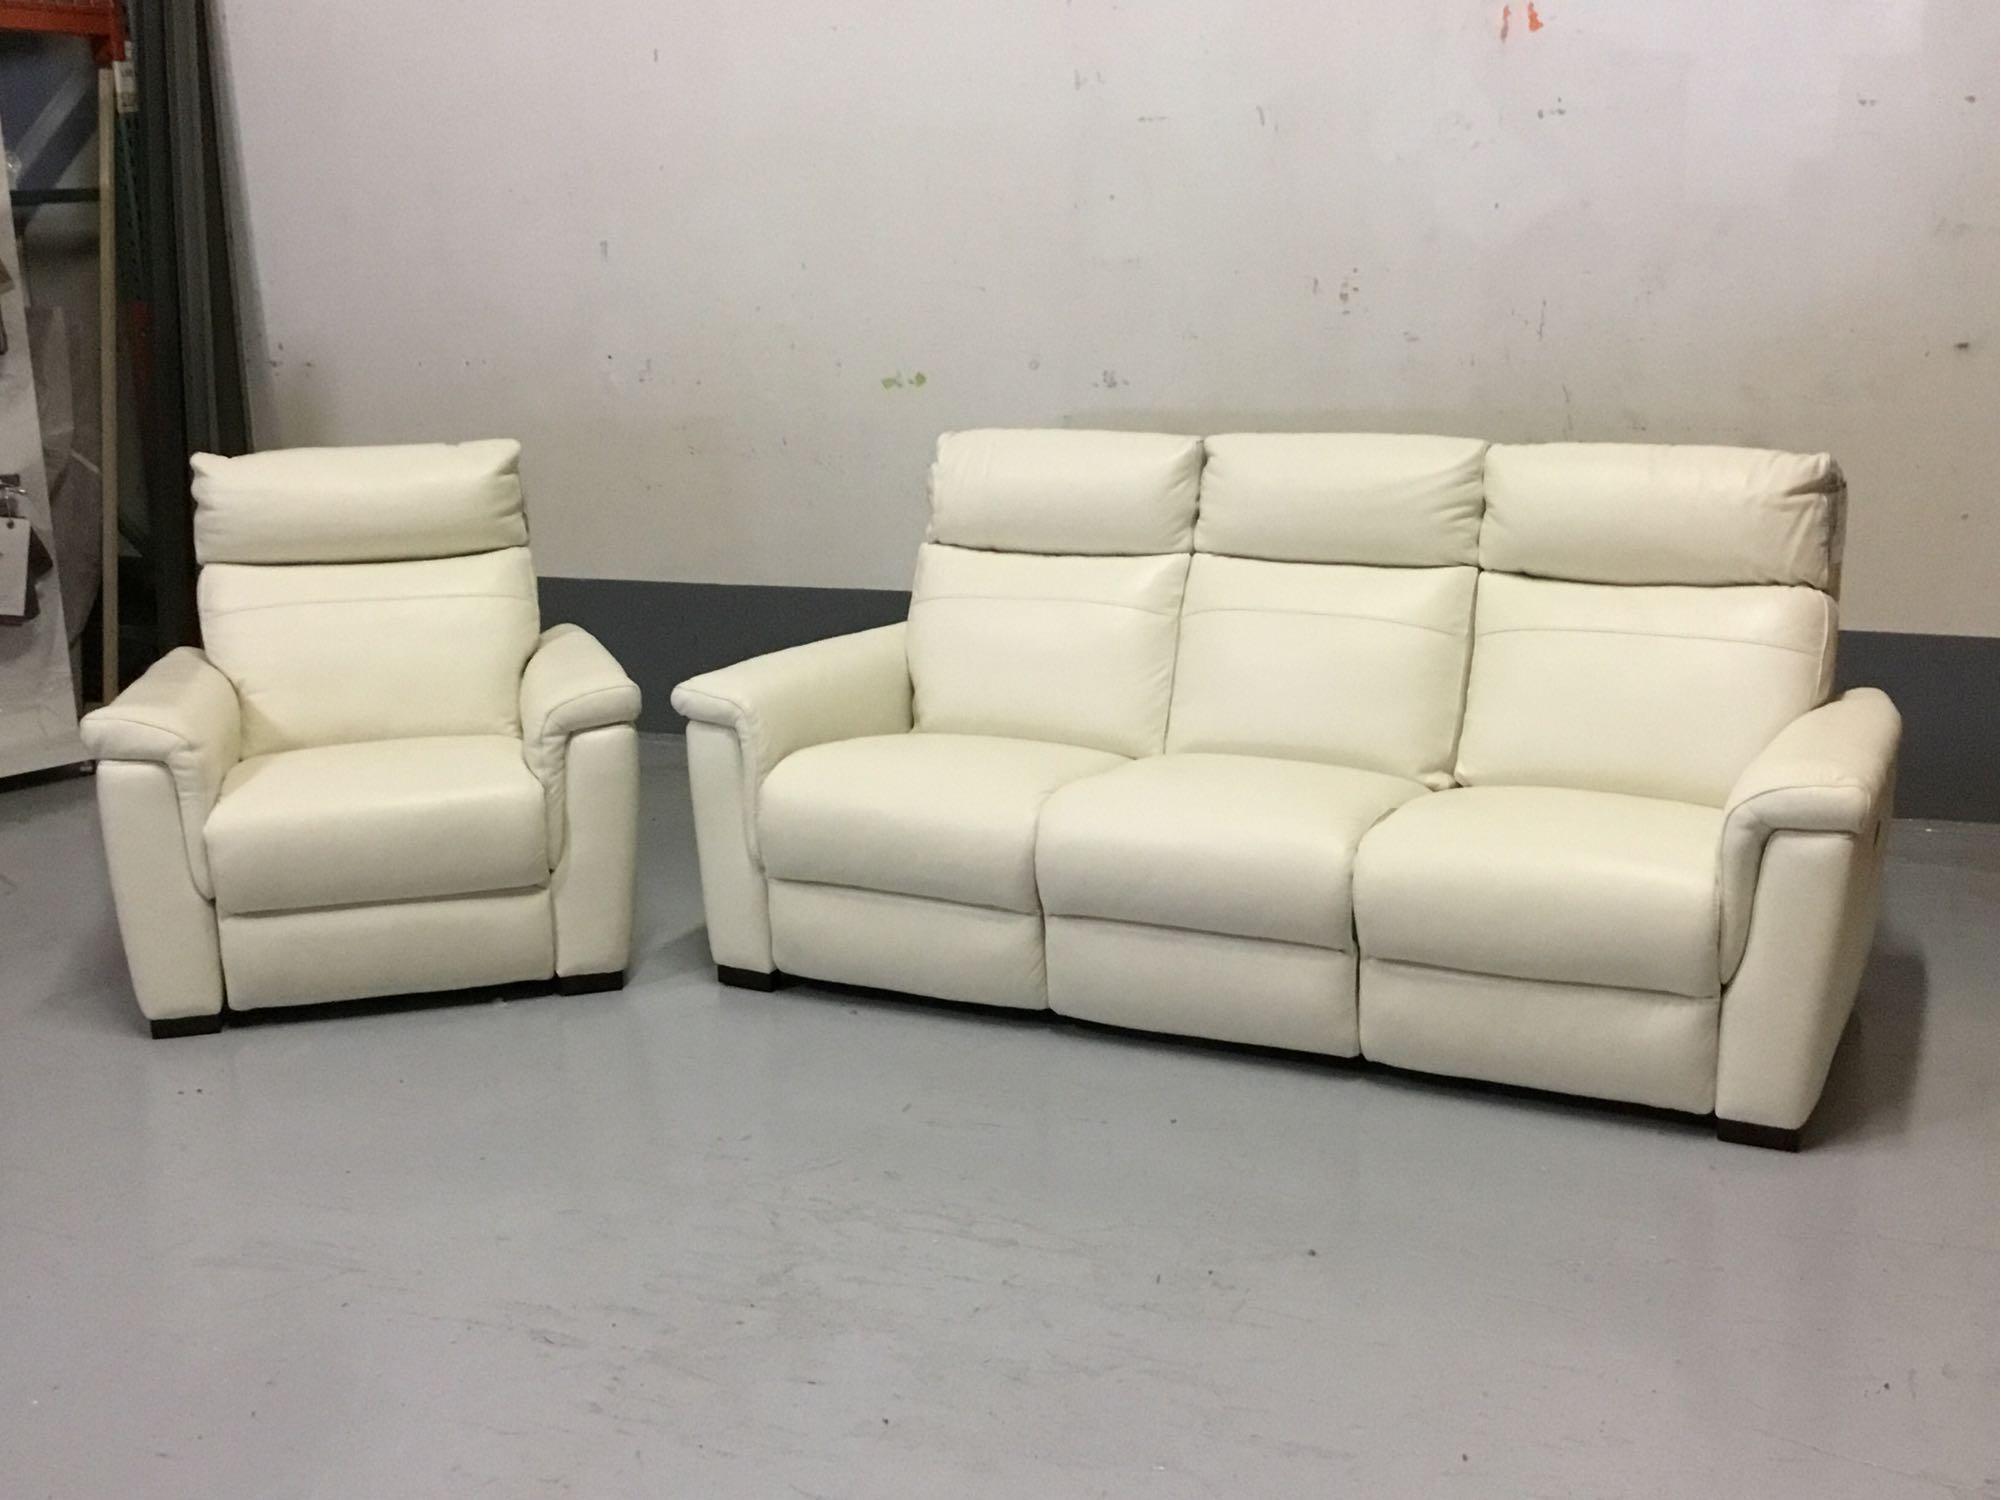 Remarkable Violino Power Reclining Torello White Leather Sofa W Machost Co Dining Chair Design Ideas Machostcouk